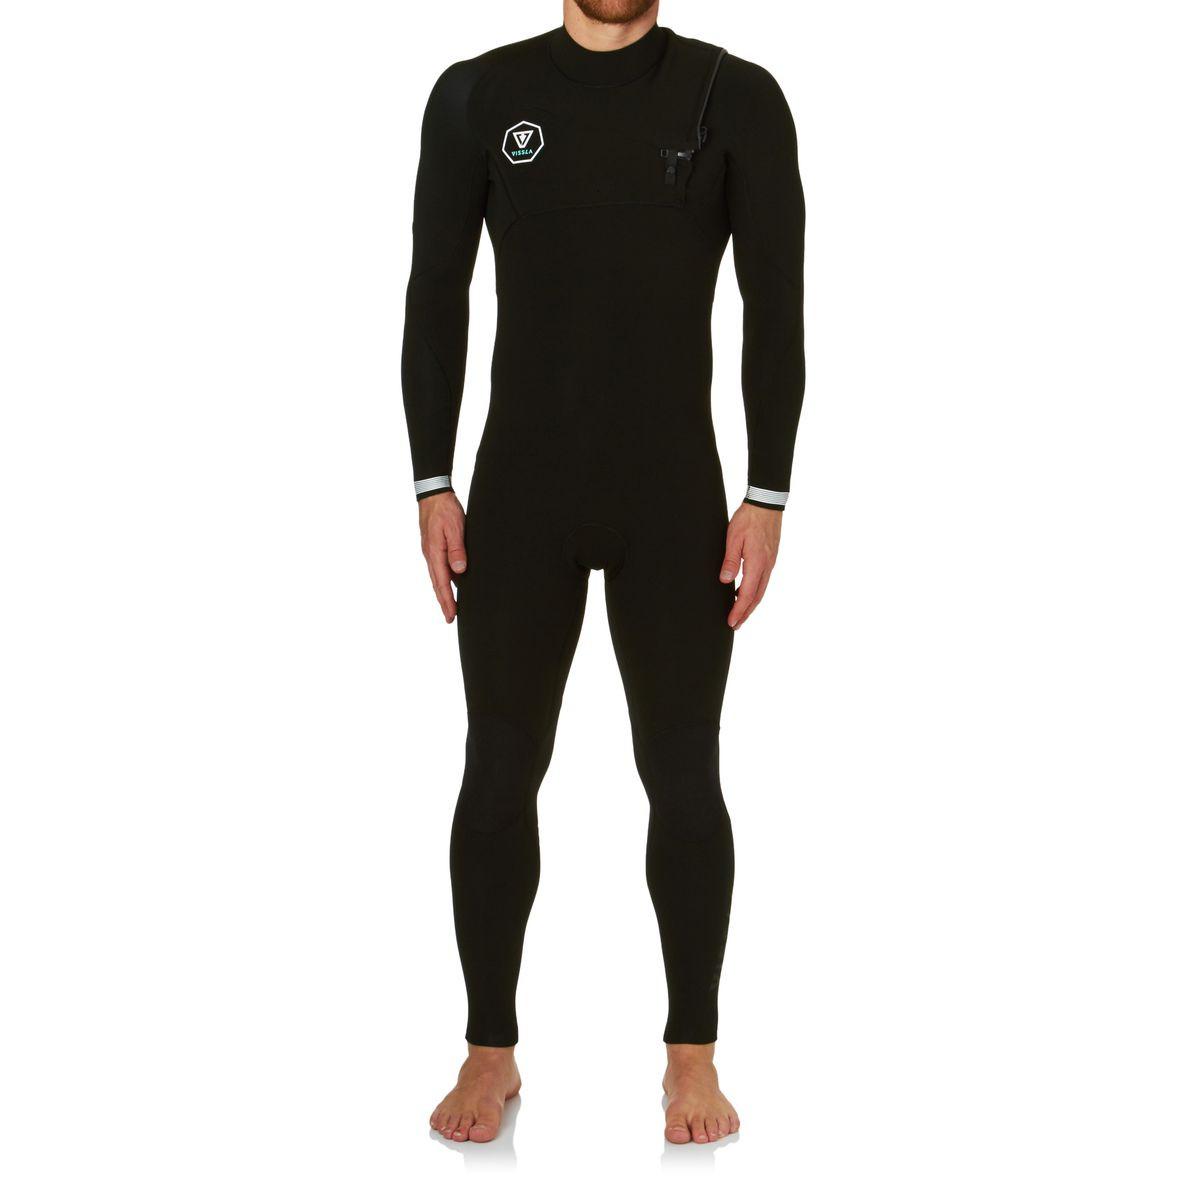 Vissla Seven Seas 3/2mm Chest Zip Wetsuit - Black With White